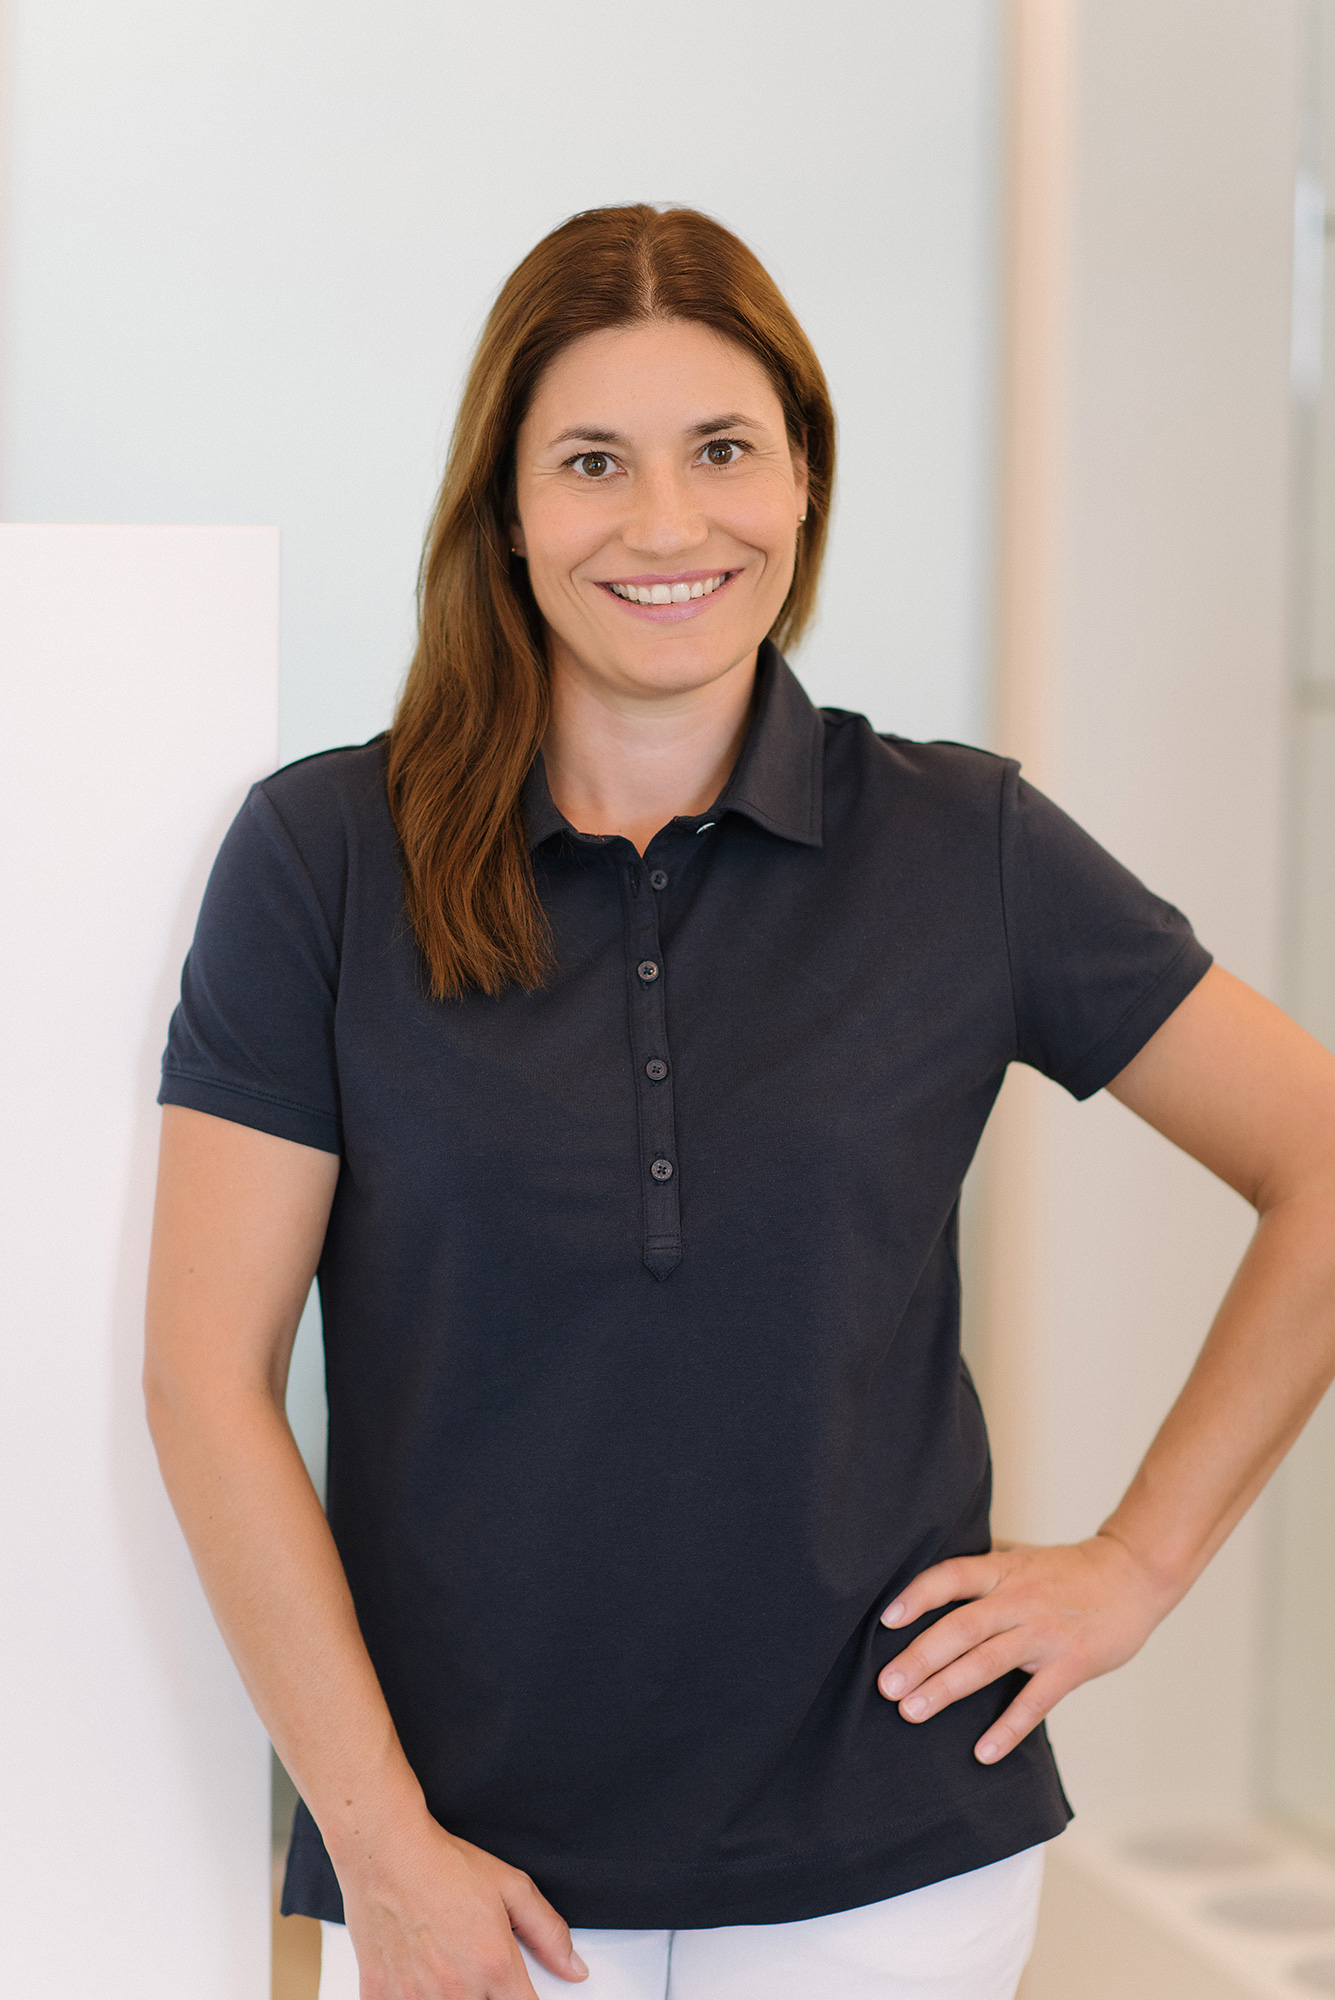 Dr. Nicole Albert